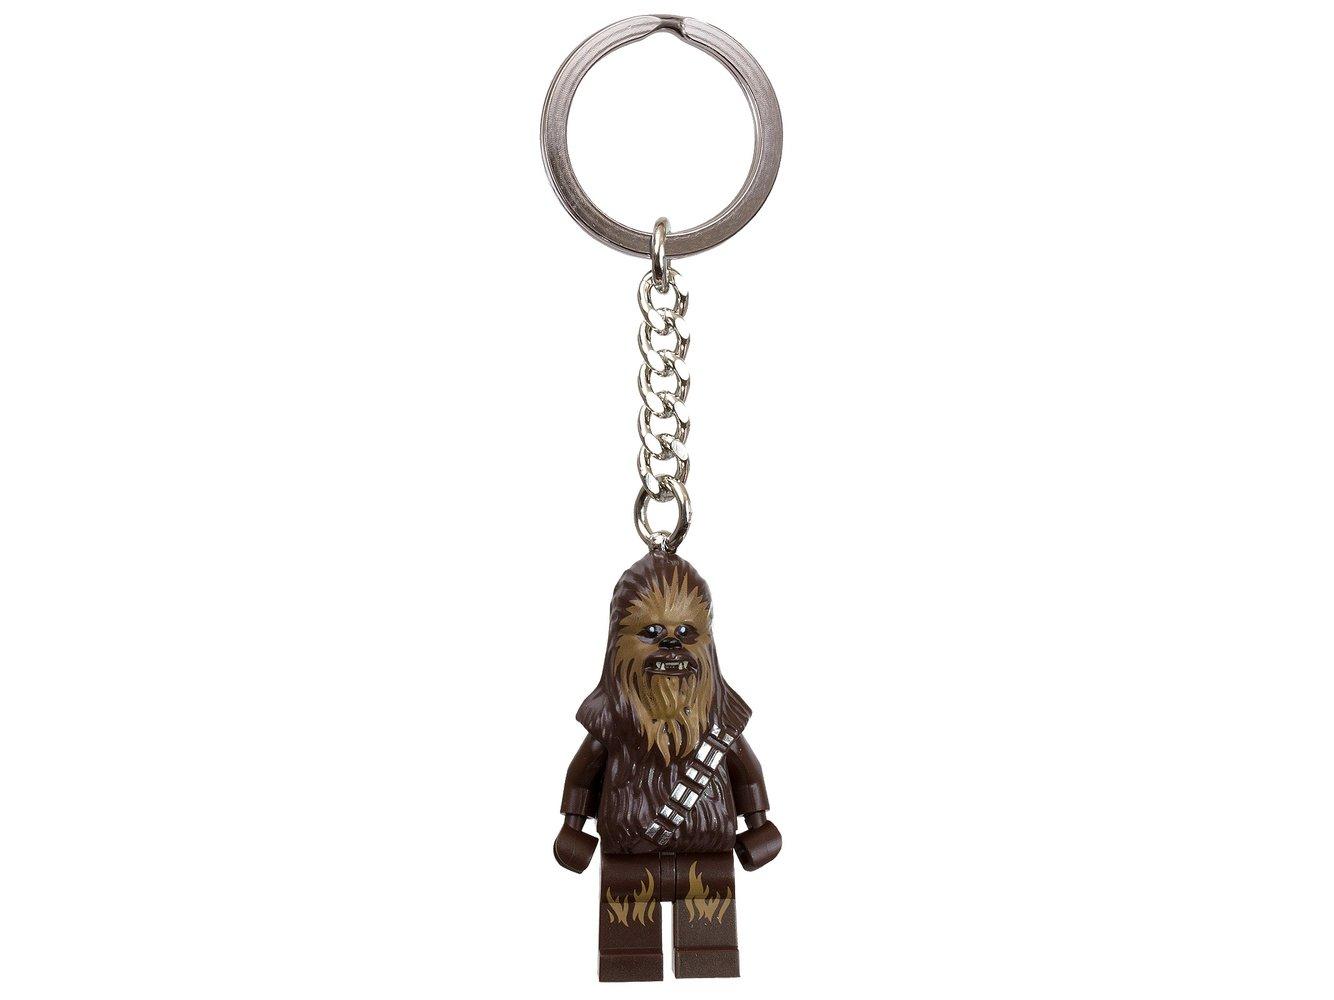 Chewbacca Key Chain